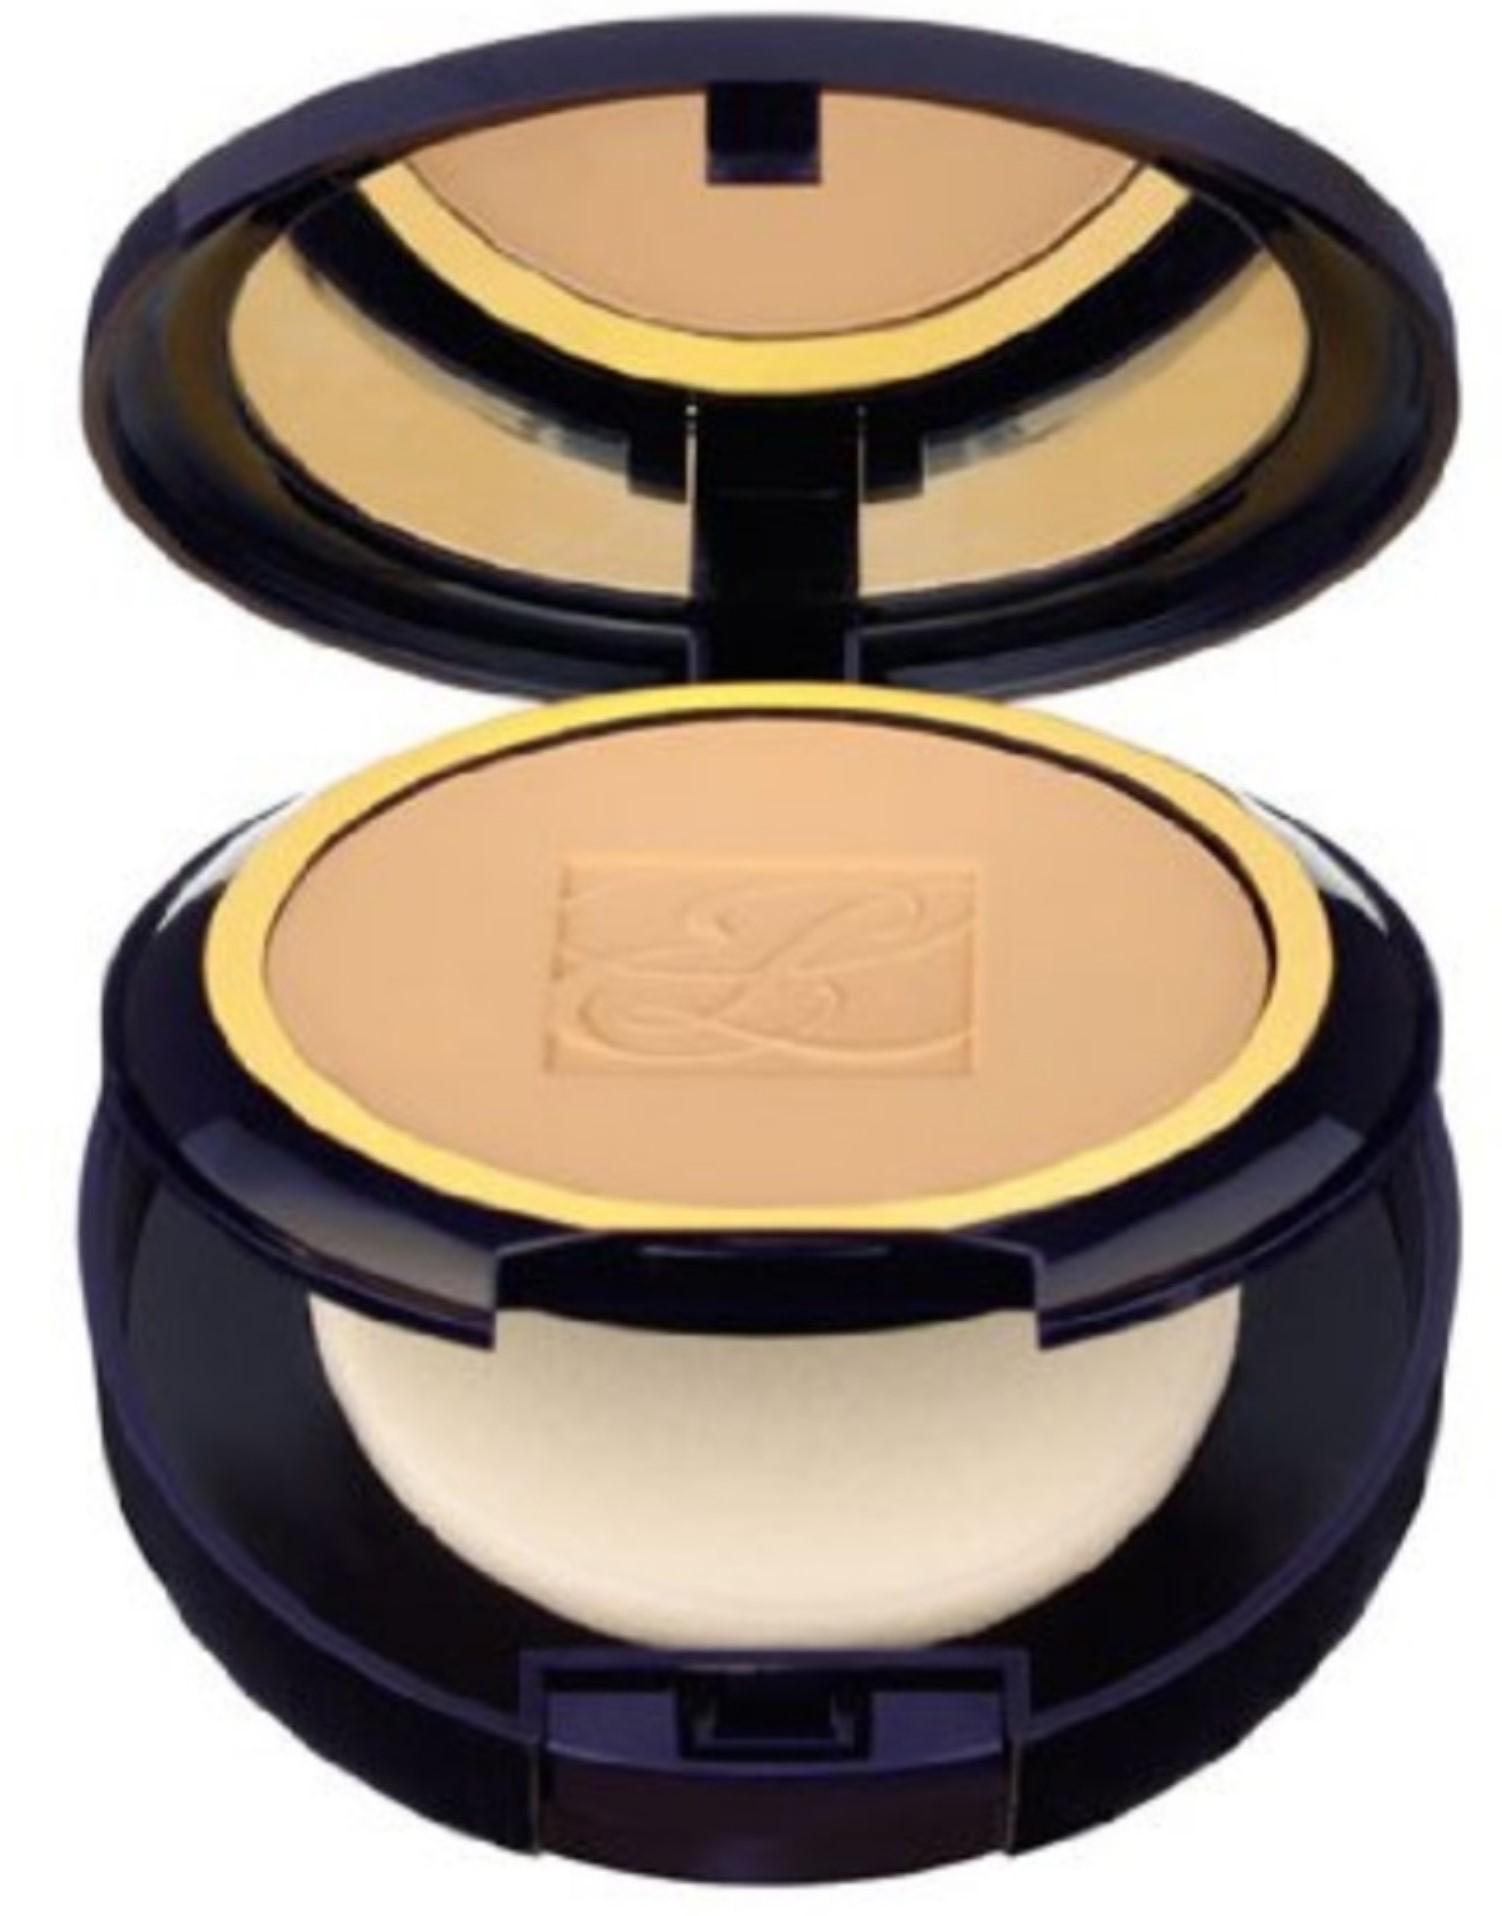 Estee Lauder Double Wear' Stay-in-Place Powder Makeup, Dawn 1 ea